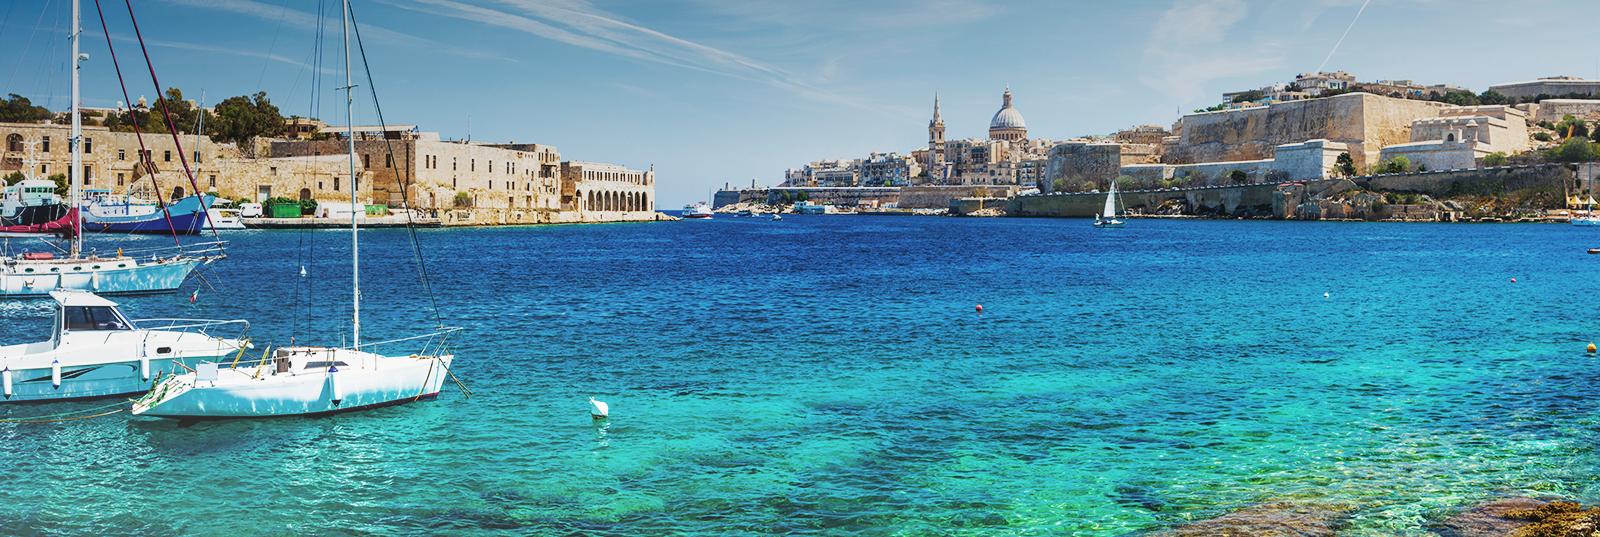 Guía turística de Malta